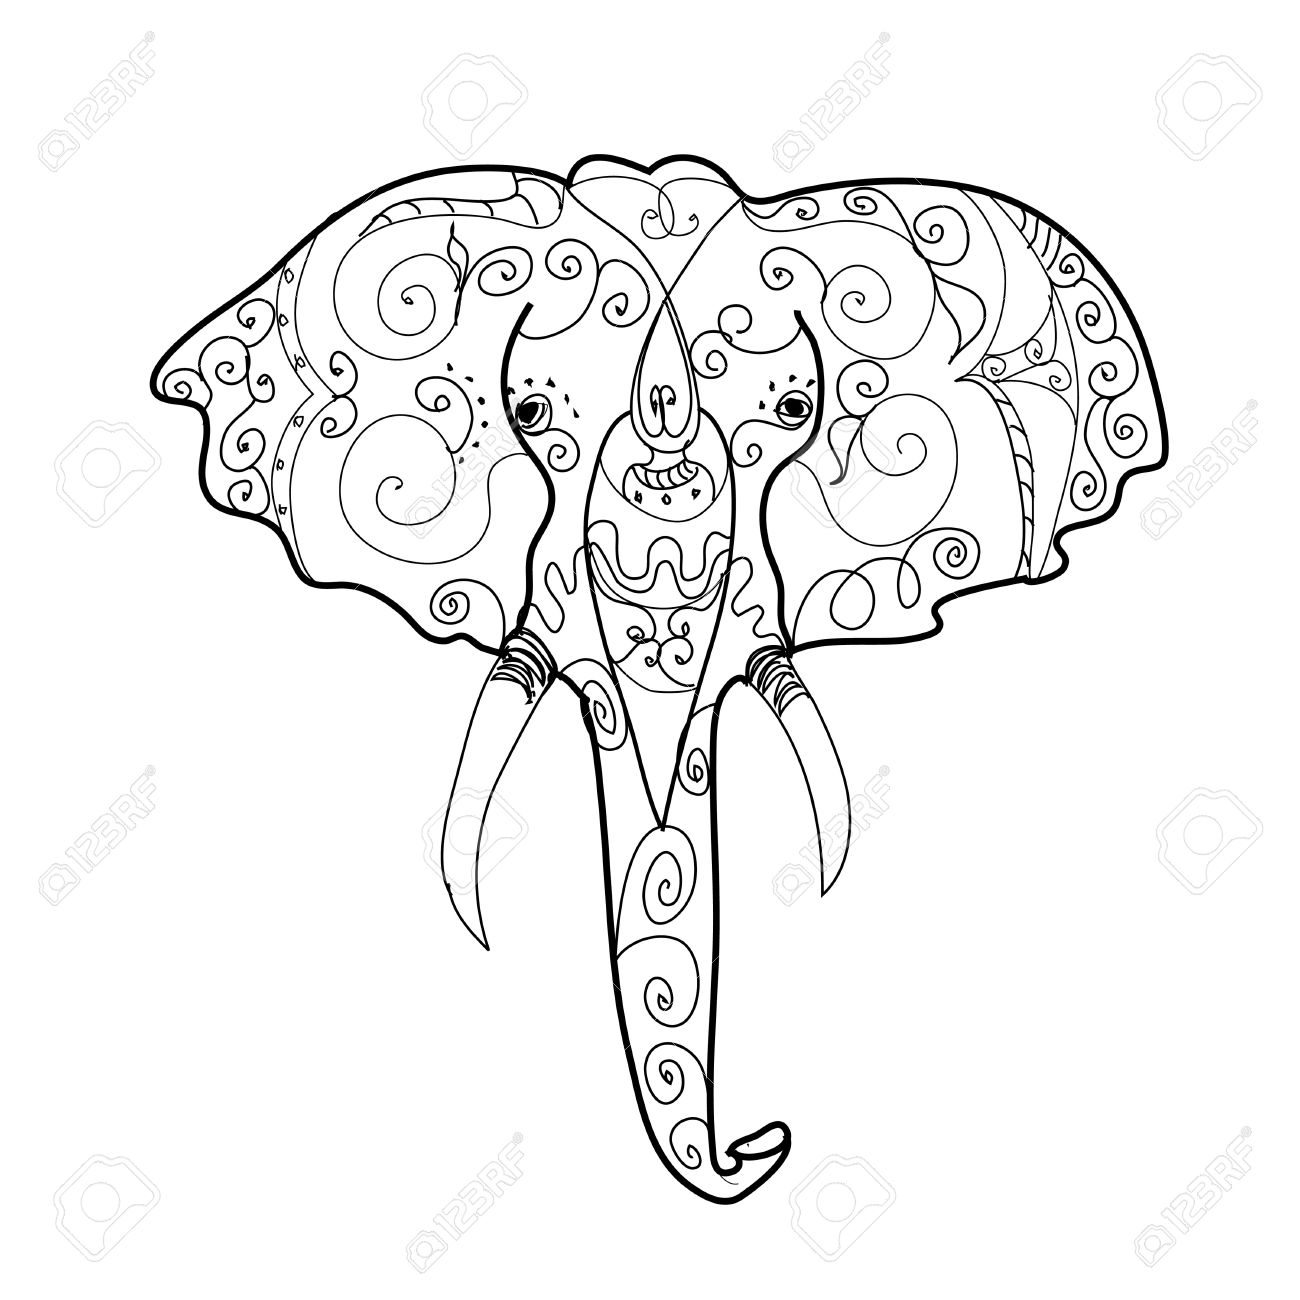 1300x1300 Elephant S Head Tattoo Royalty Free Cliparts, Vectors, And Stock